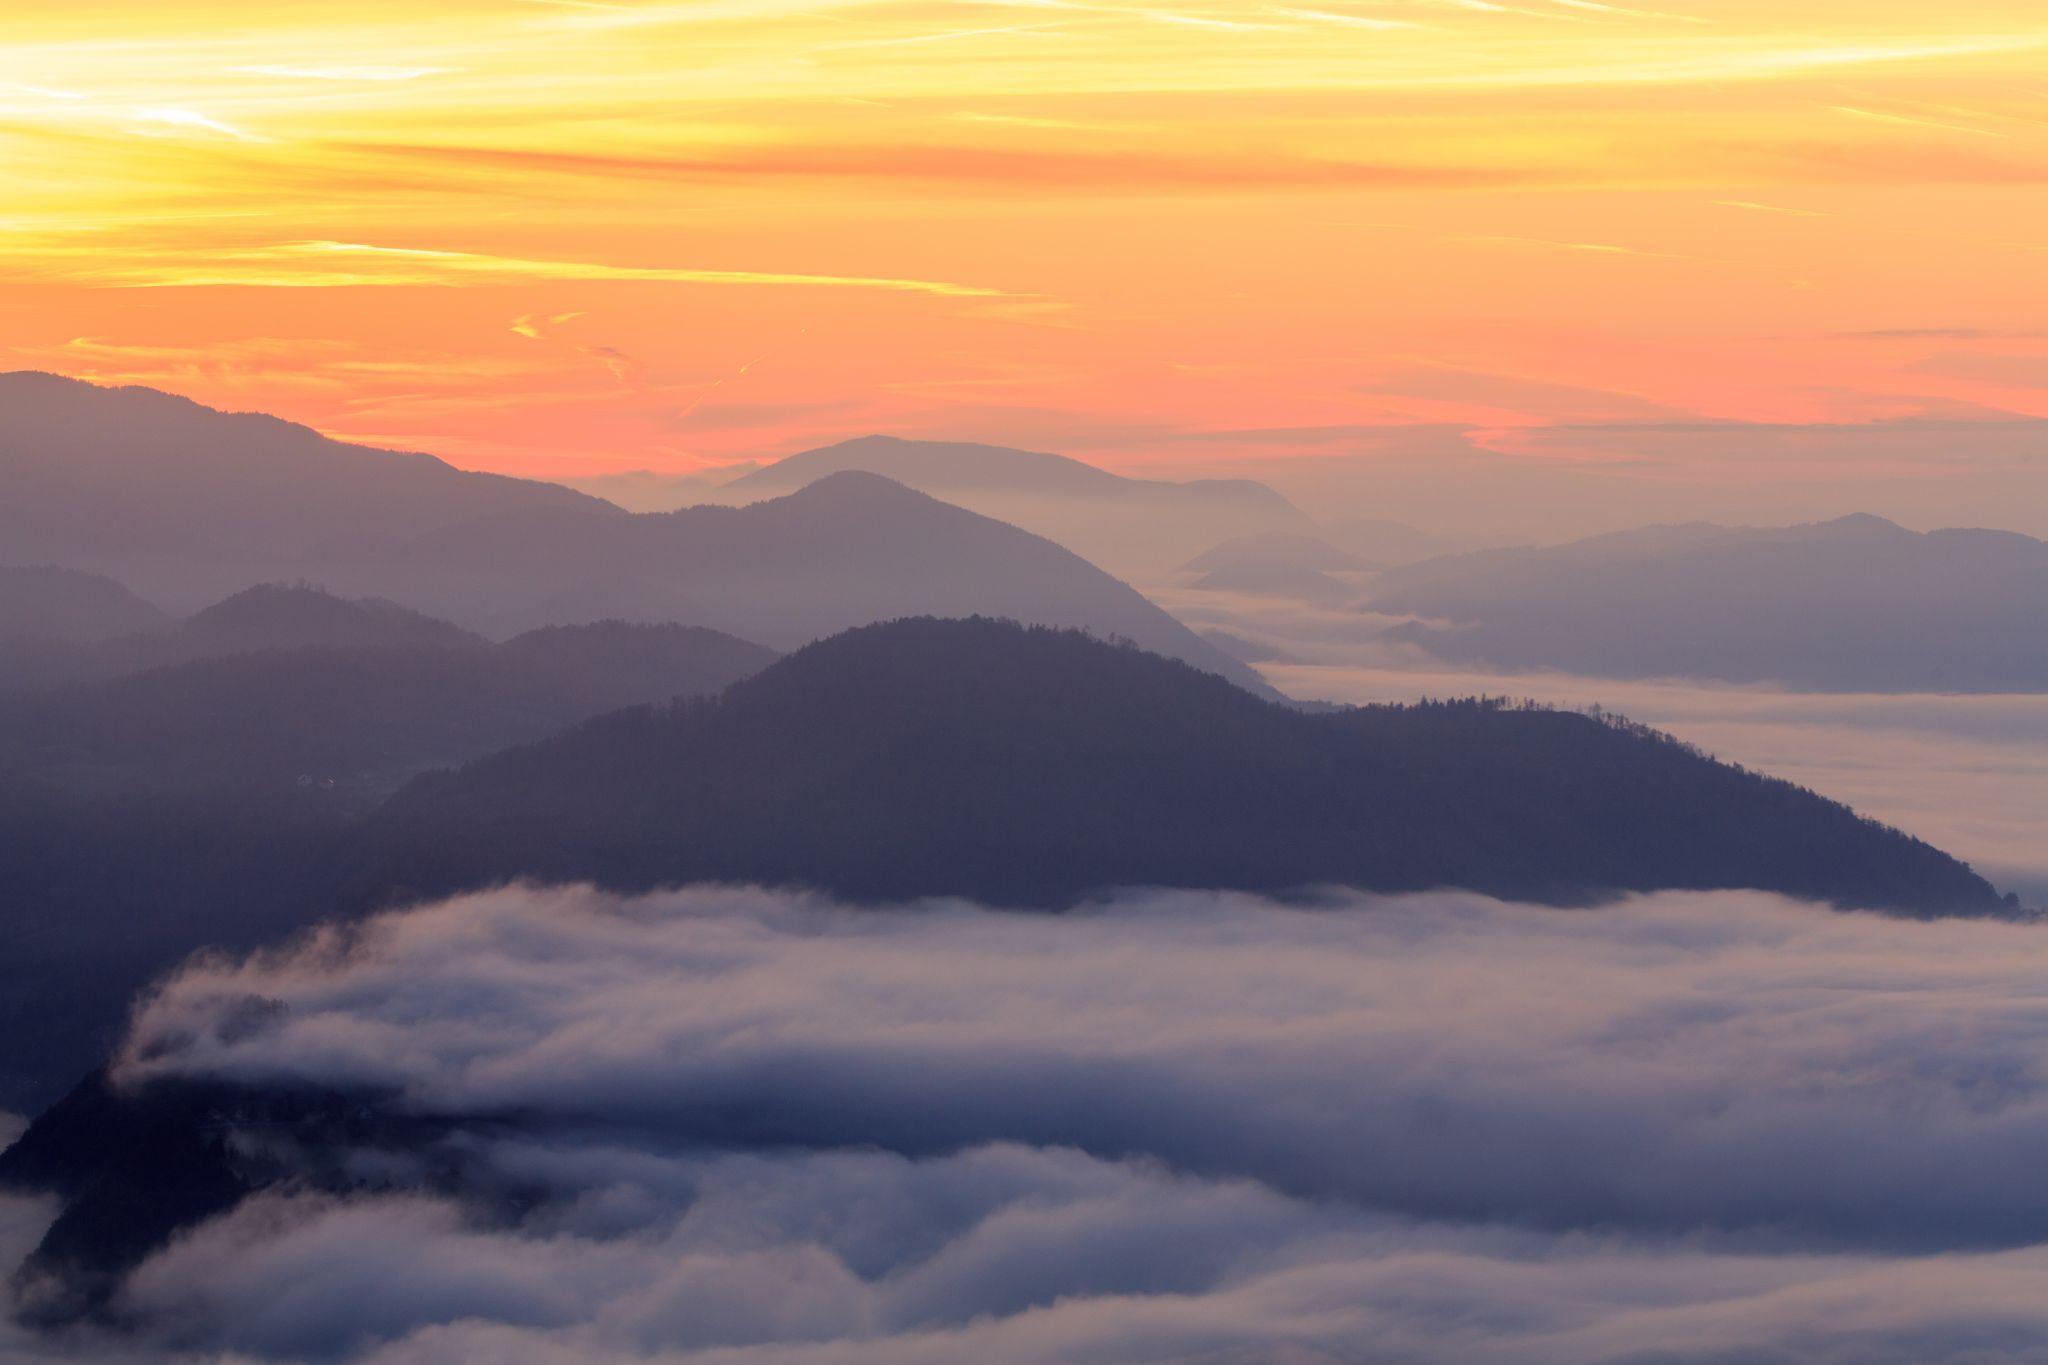 Morning, Slovenia